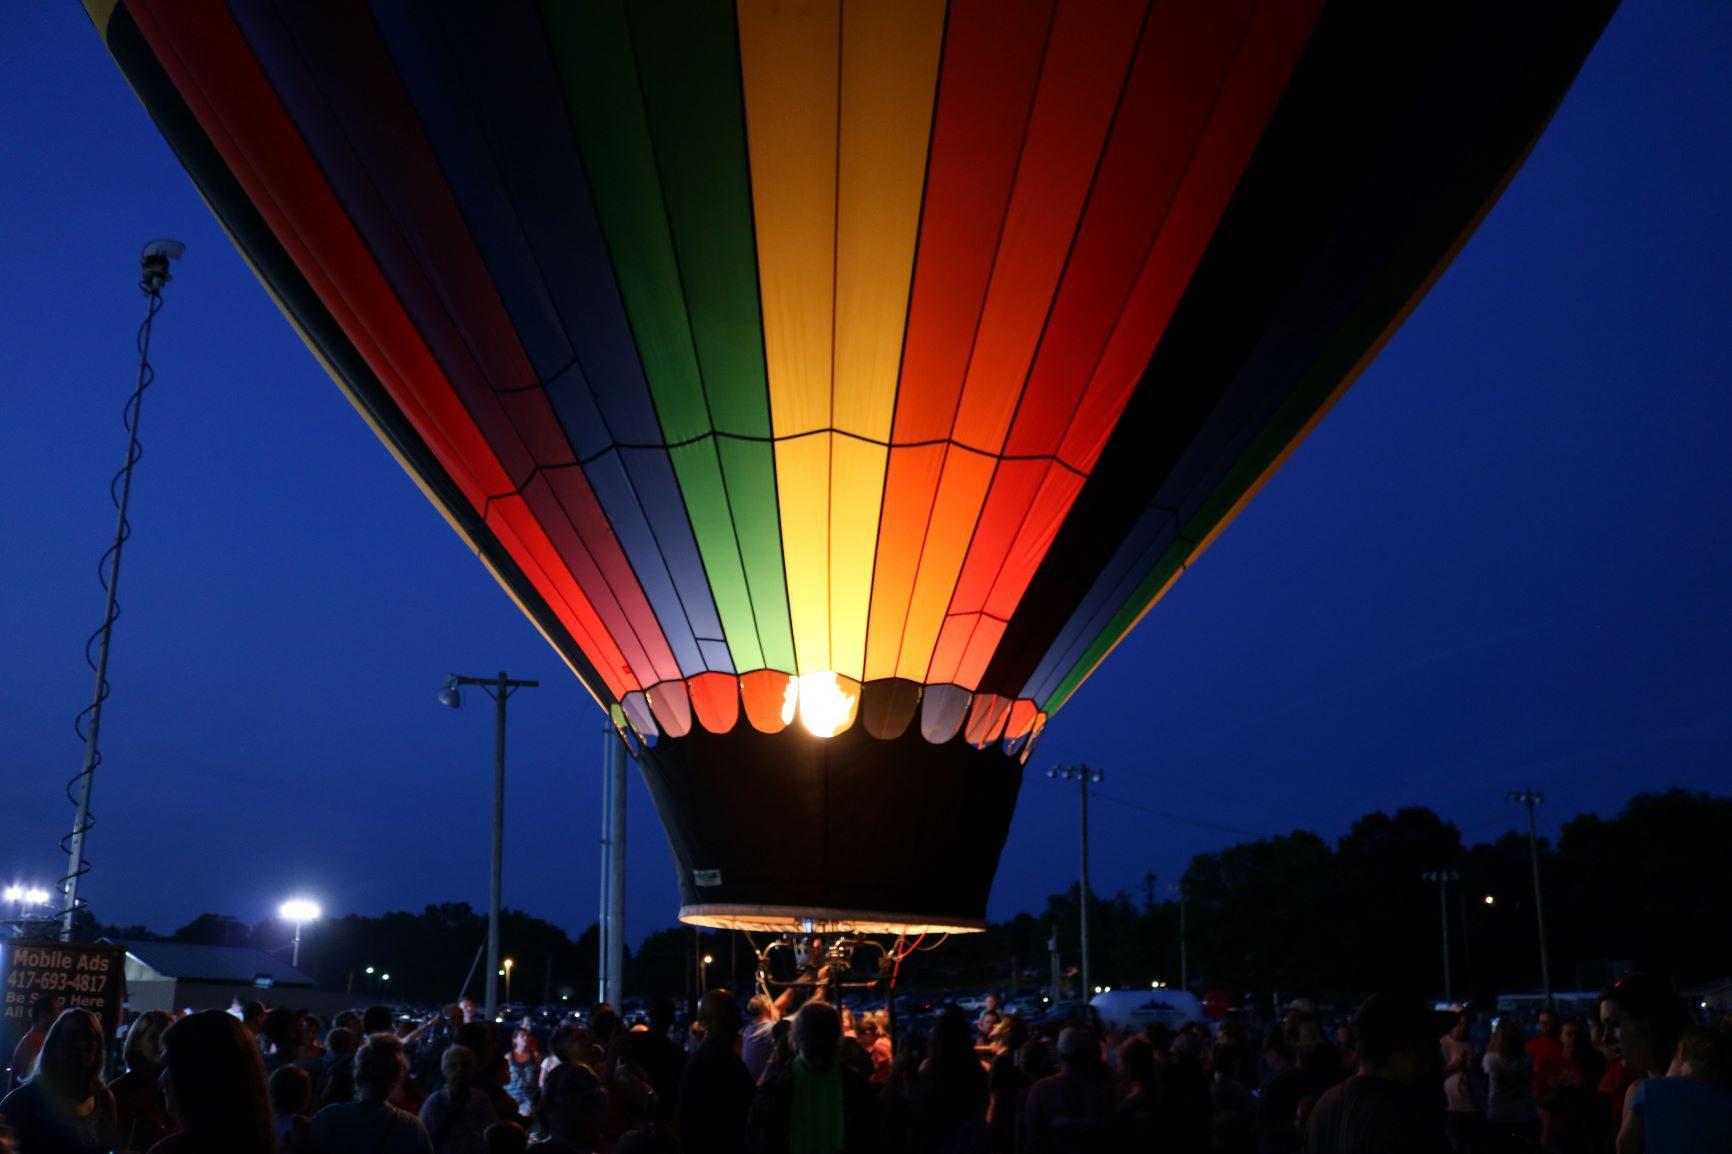 colorful hot air ballon